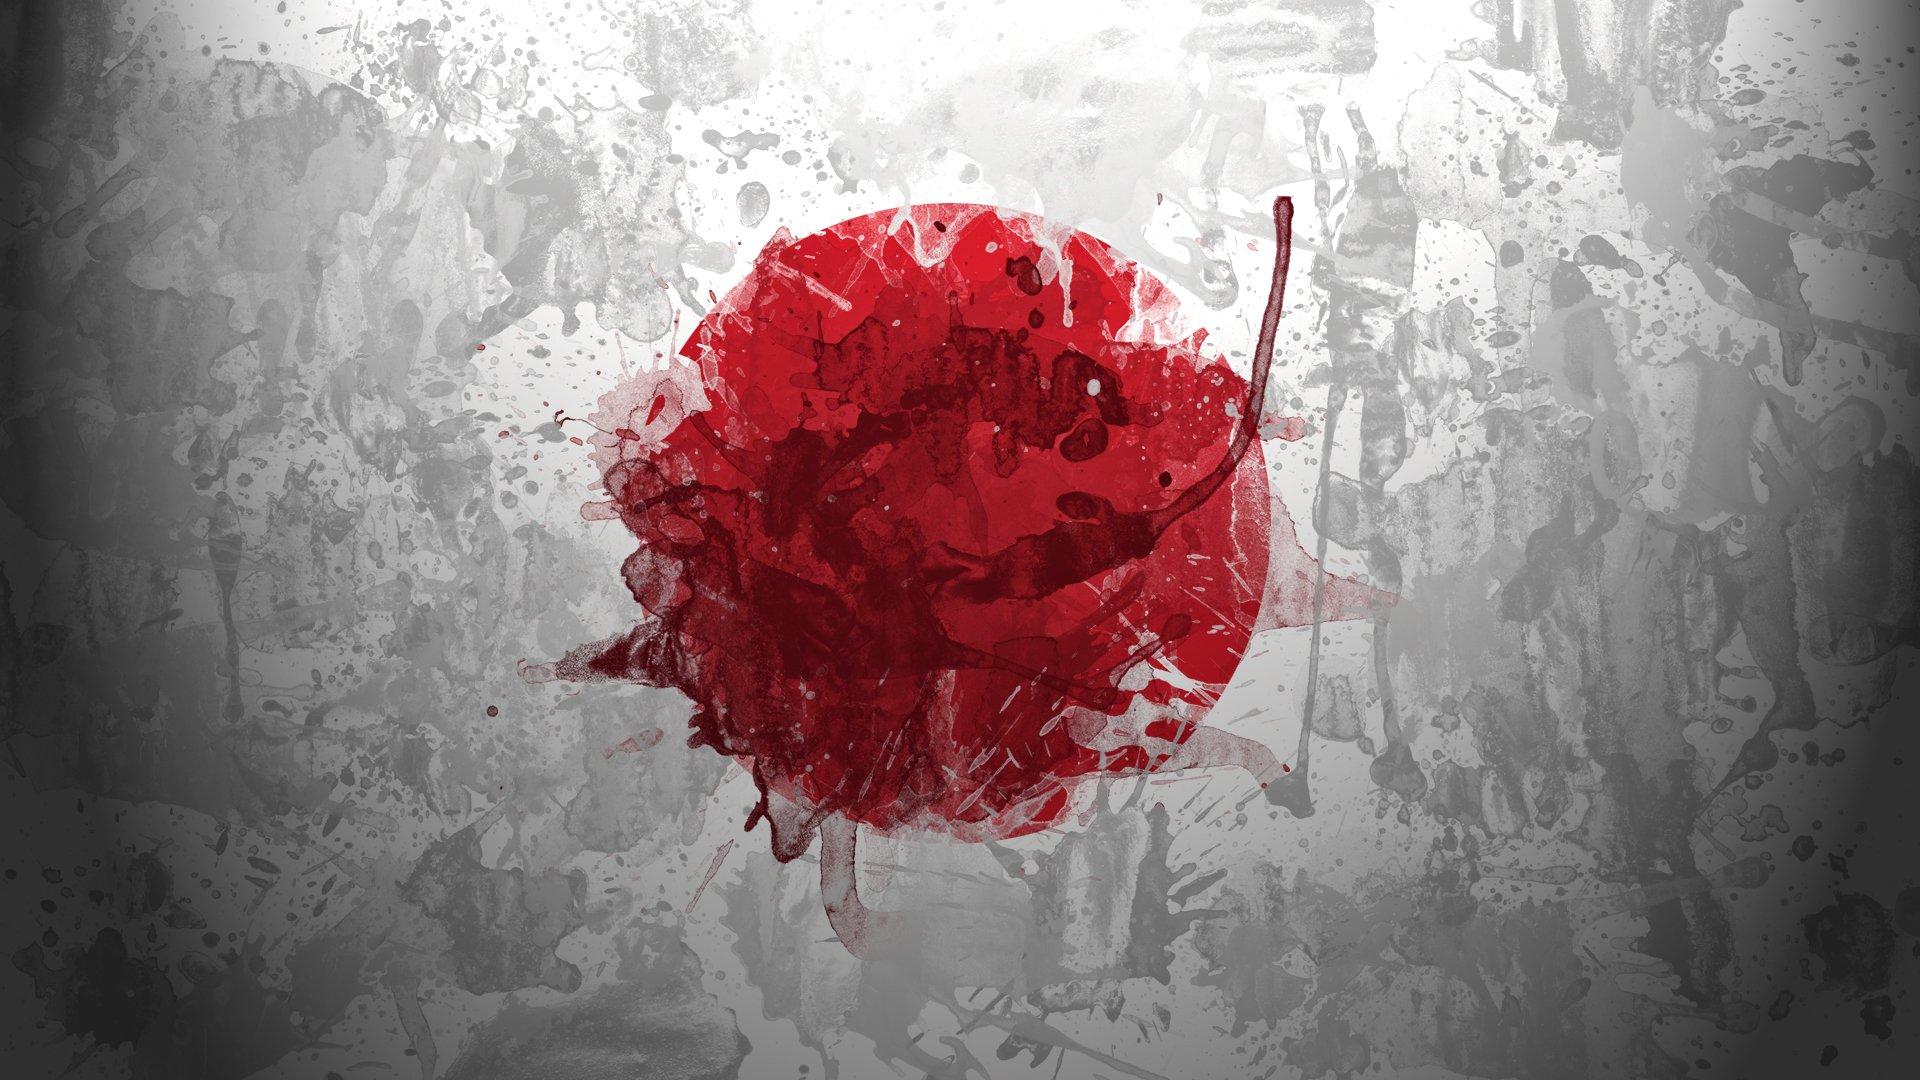 Hd wallpaper japan - Hd Wallpaper Background Id 176480